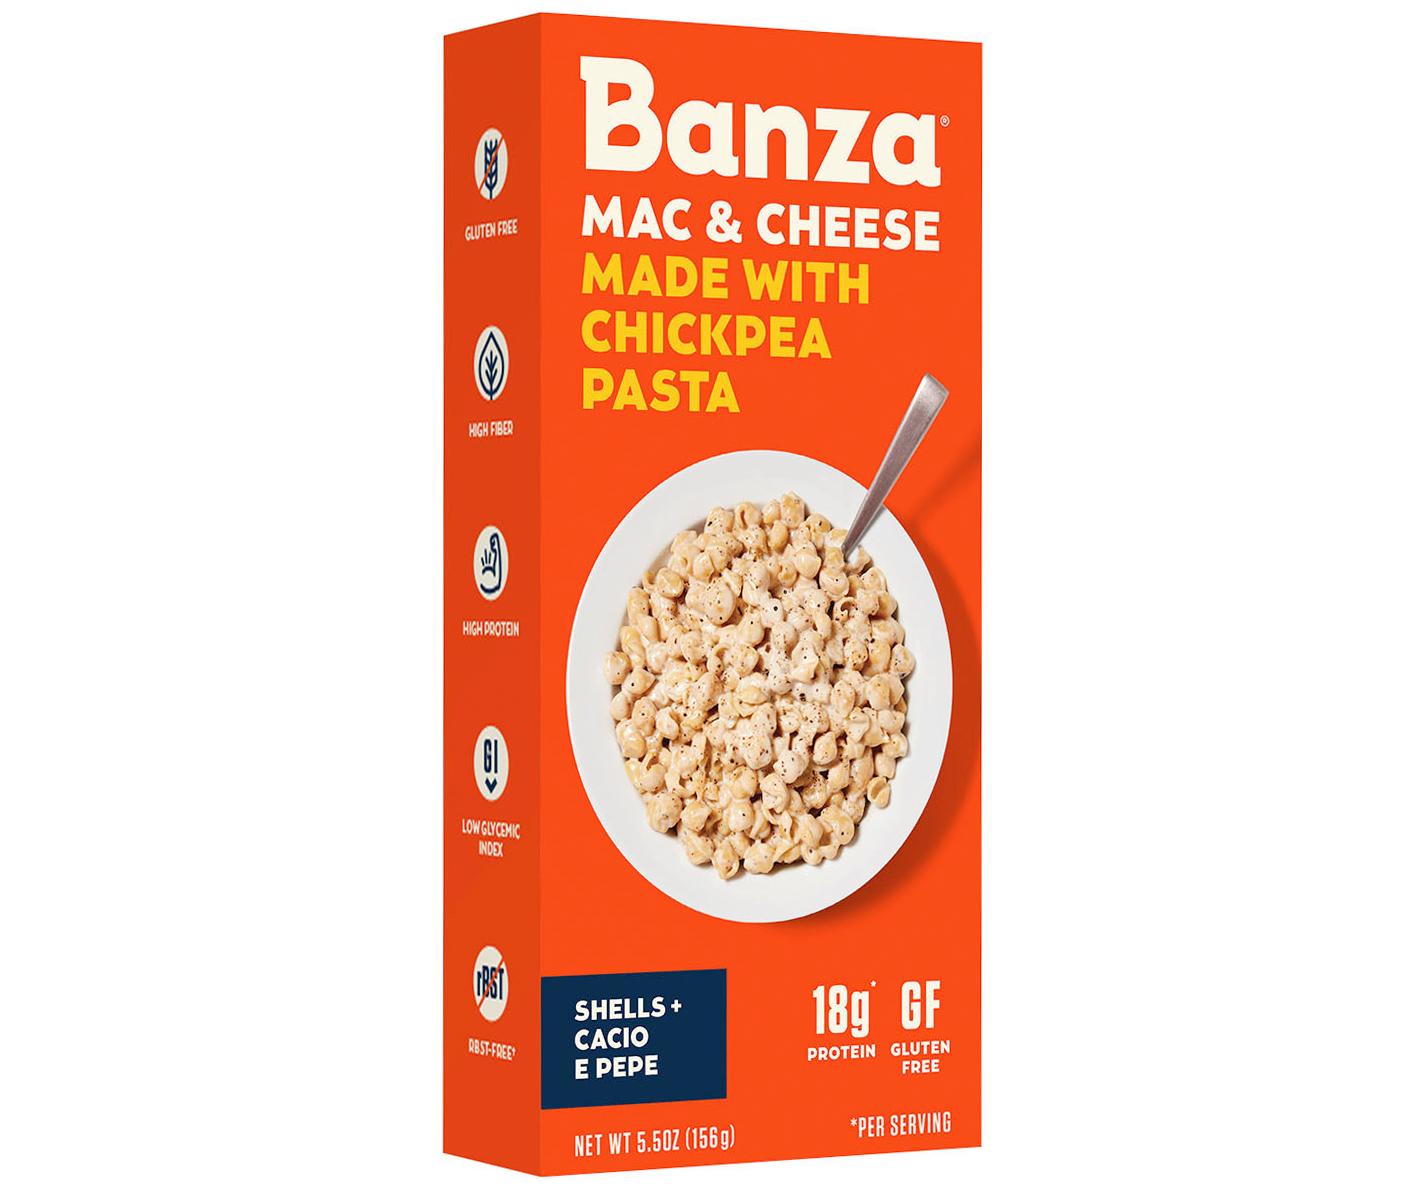 banza mac and cheese shells and cacio e pepe